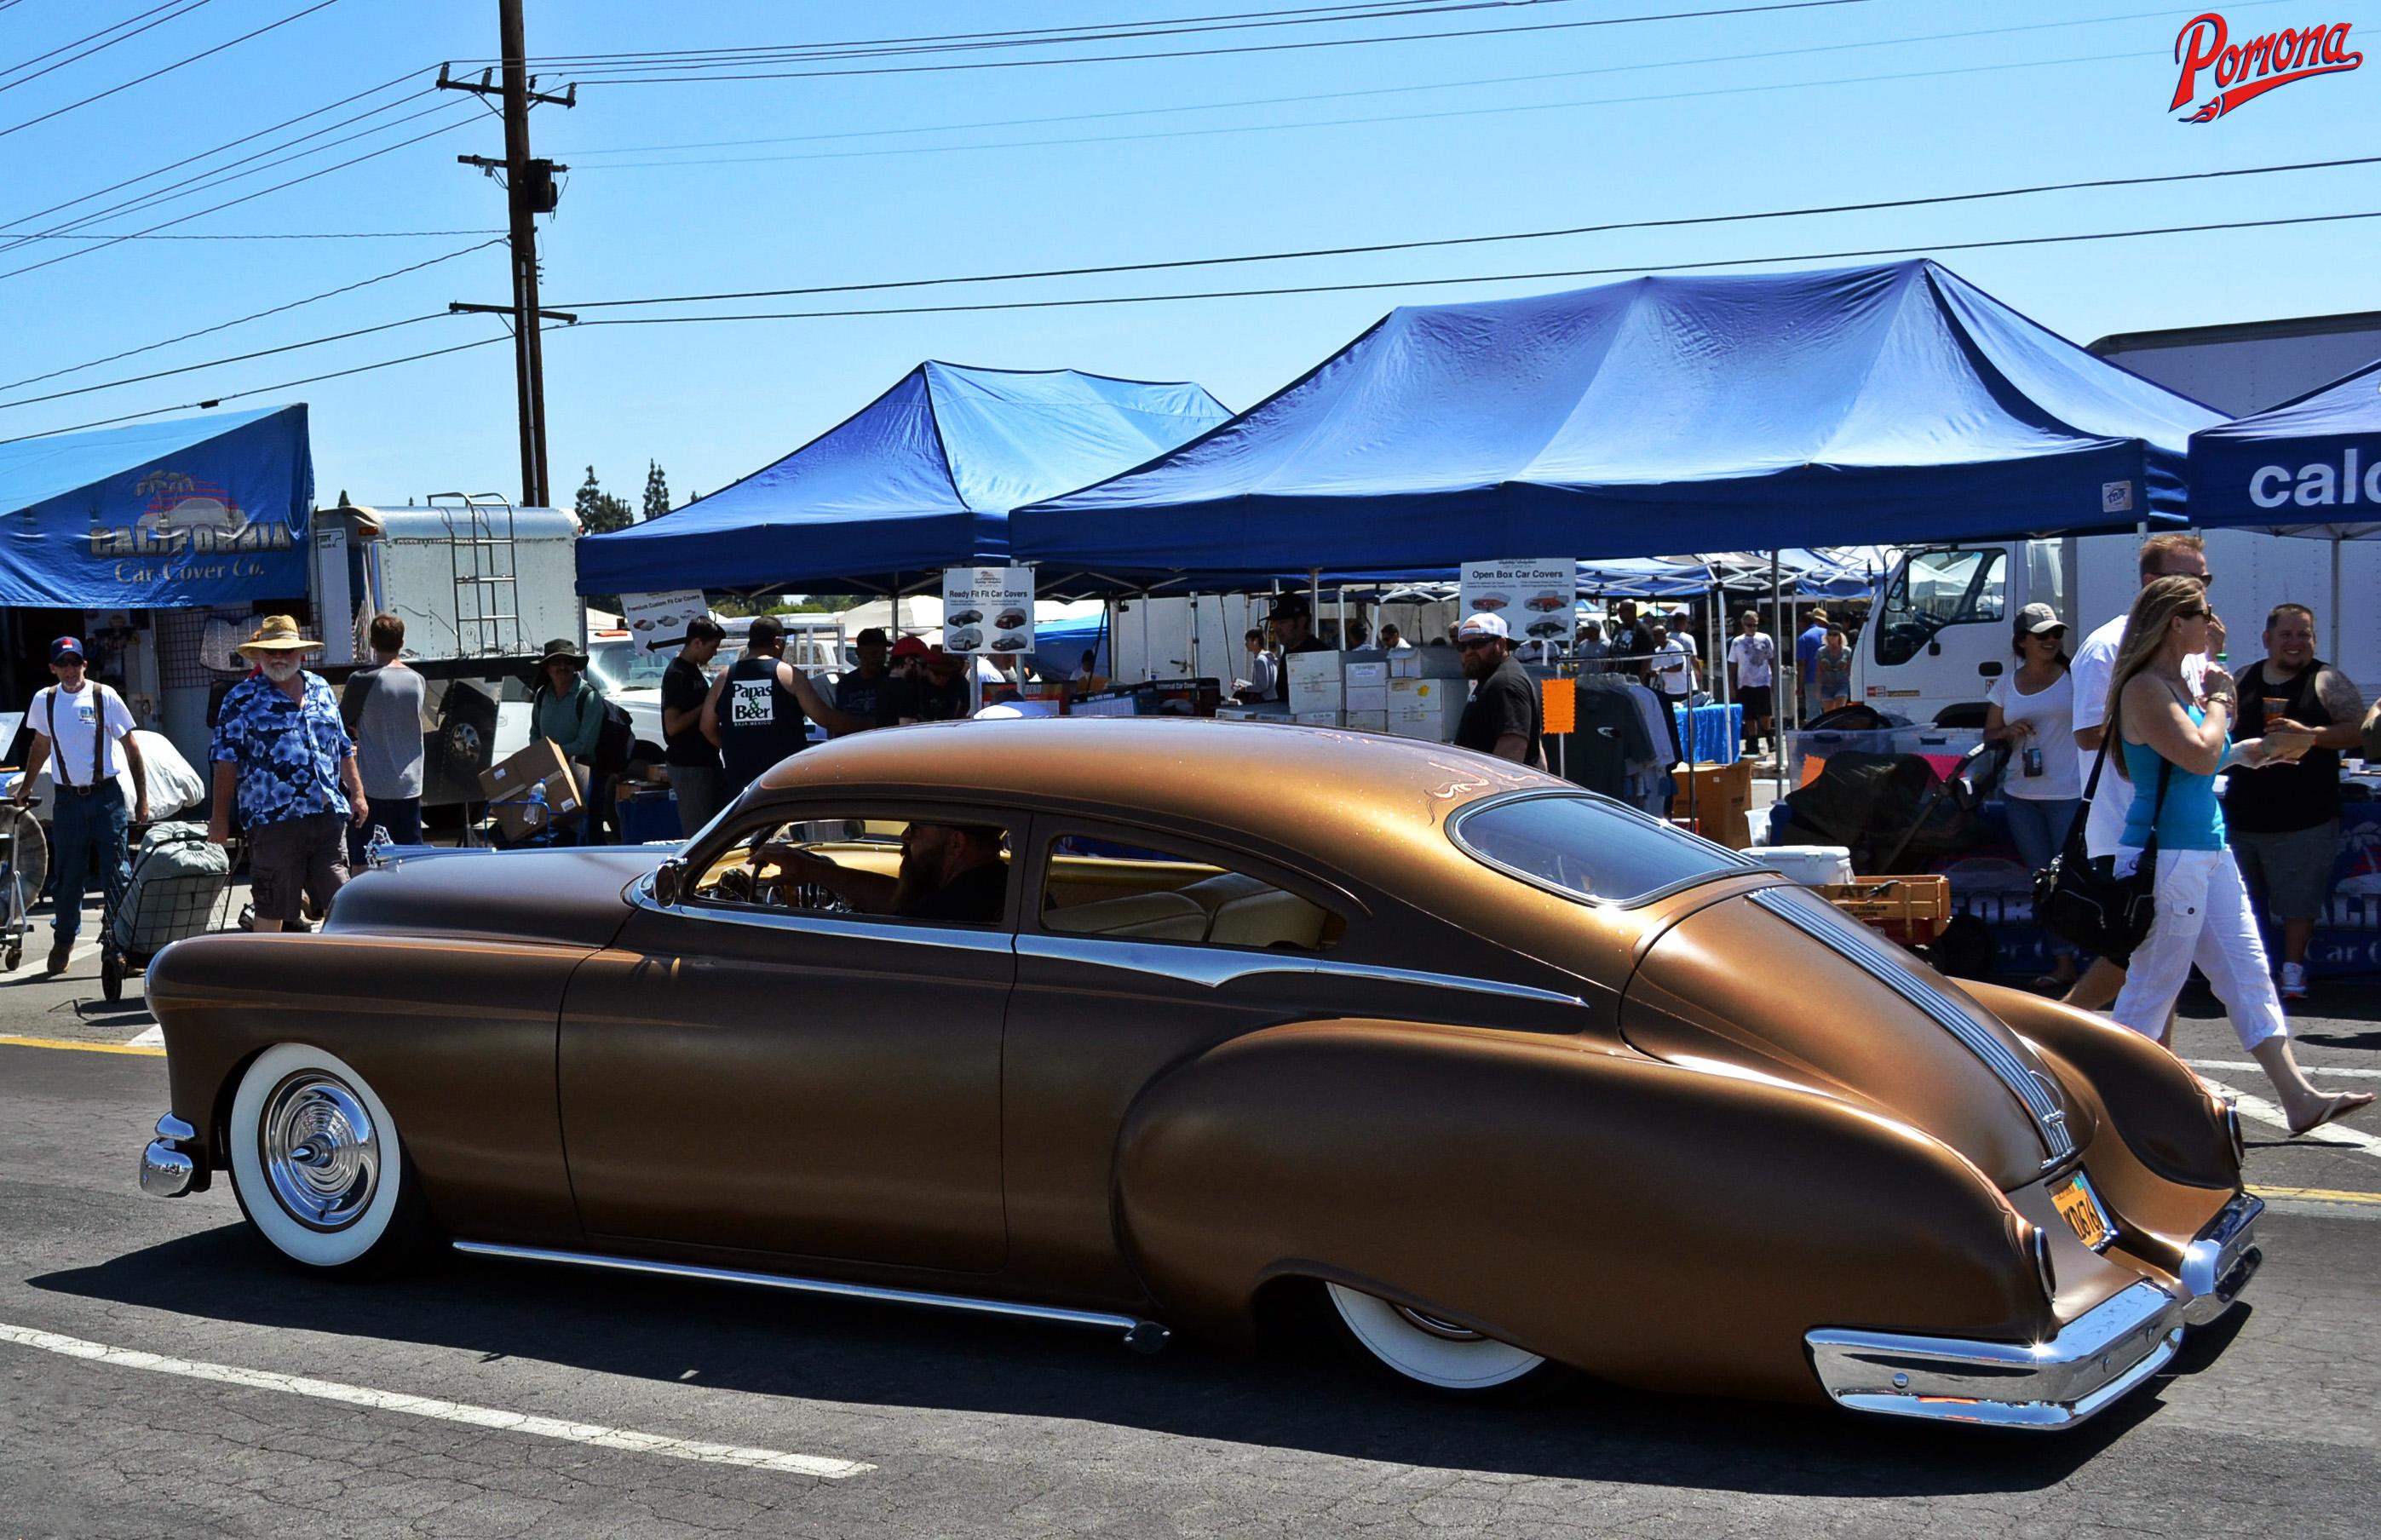 Classic Pontiac